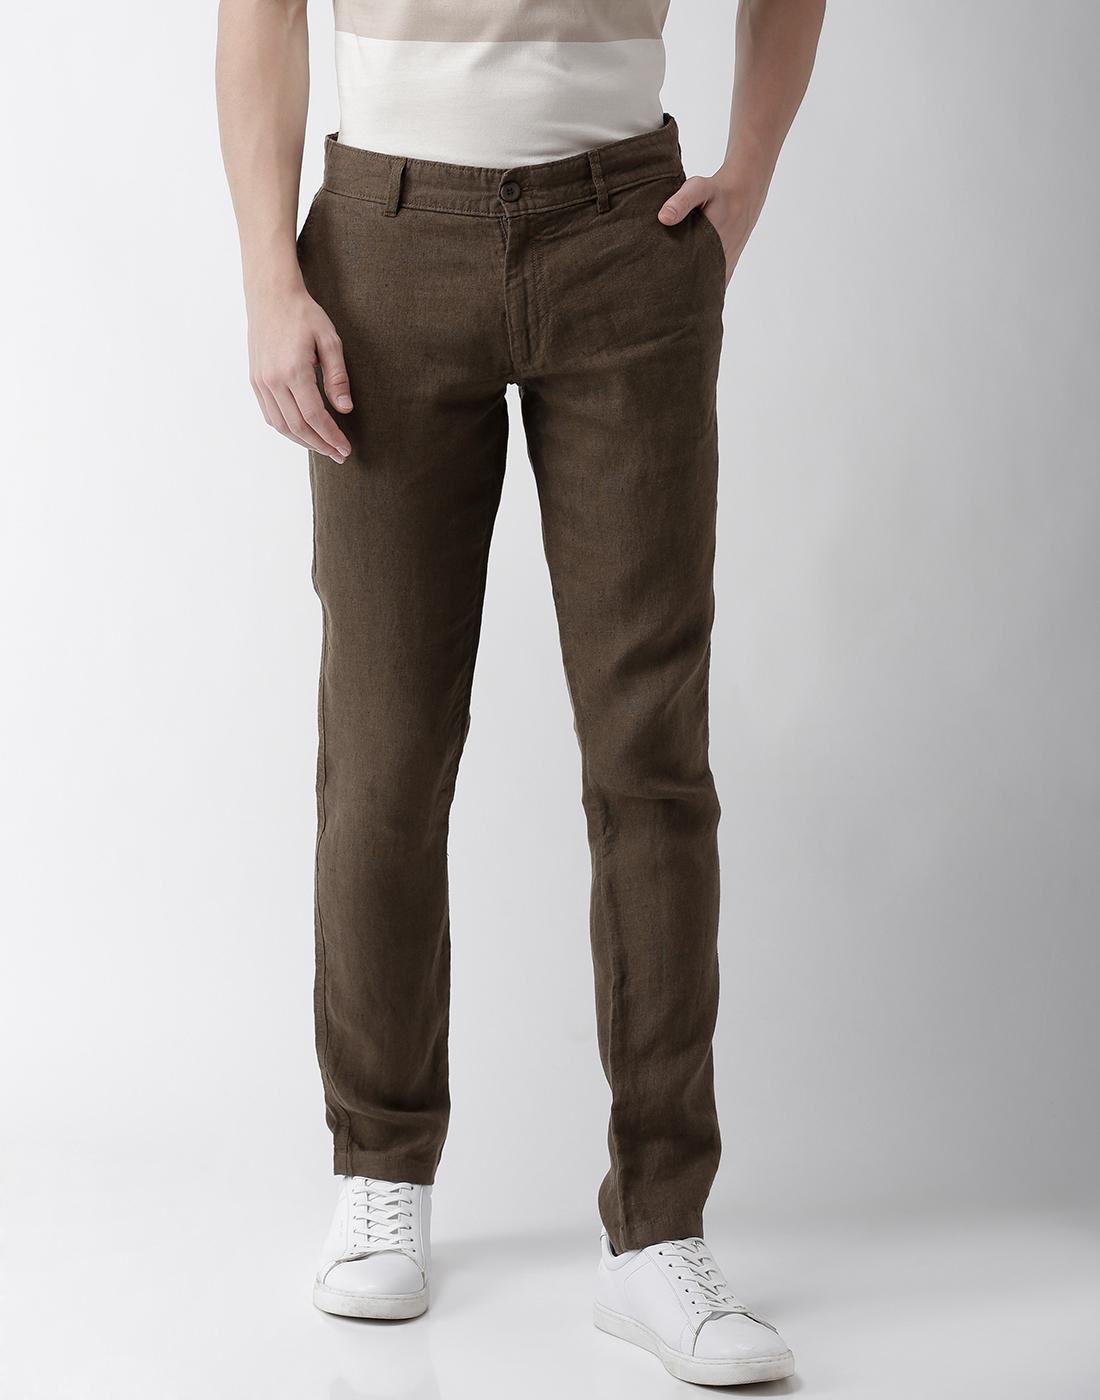 celio | 100% Linen Slim Fit Red Trouser